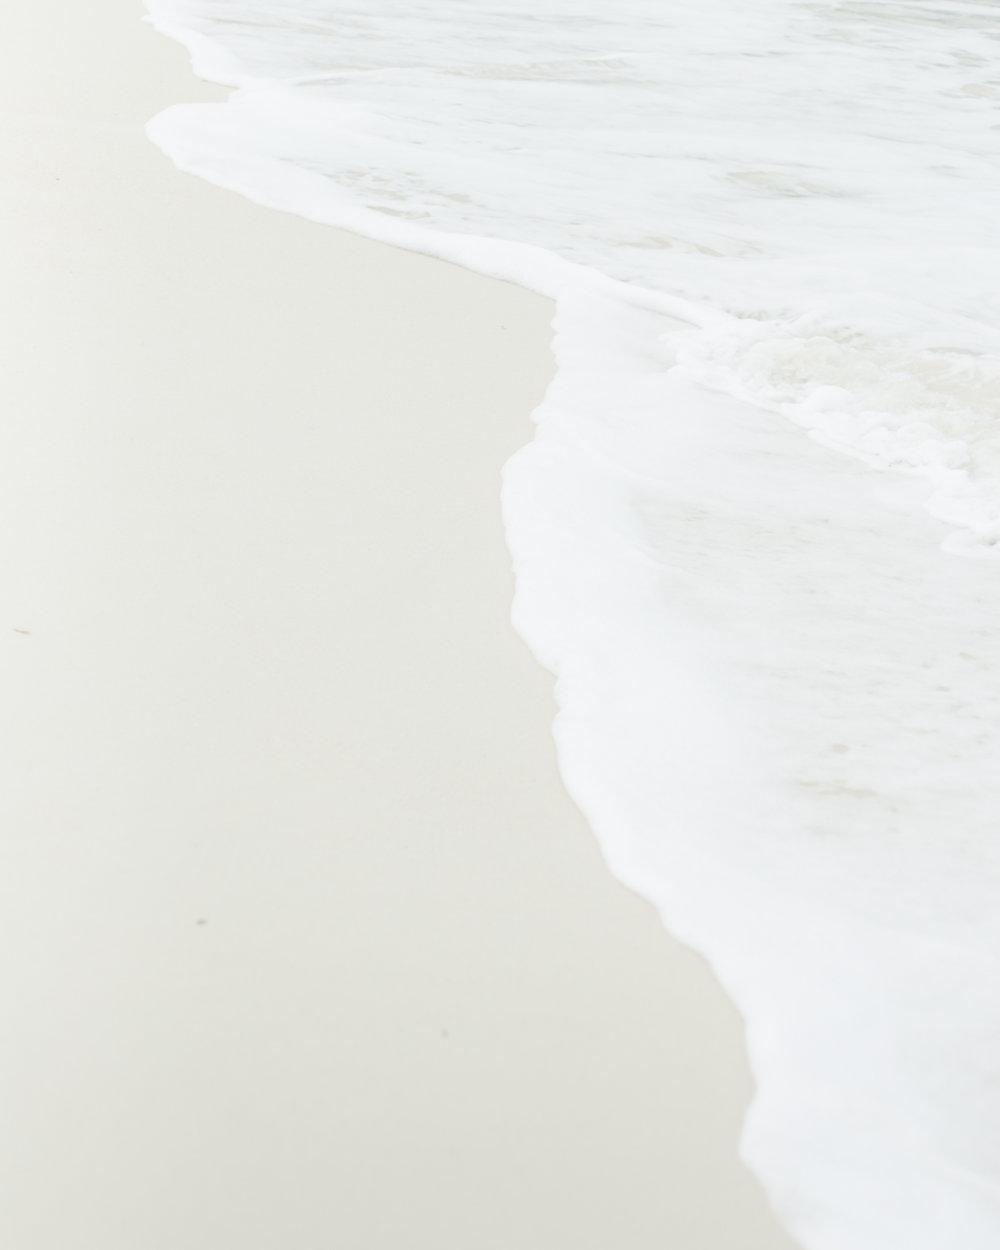 turksandcaicosbeachoceanwaves